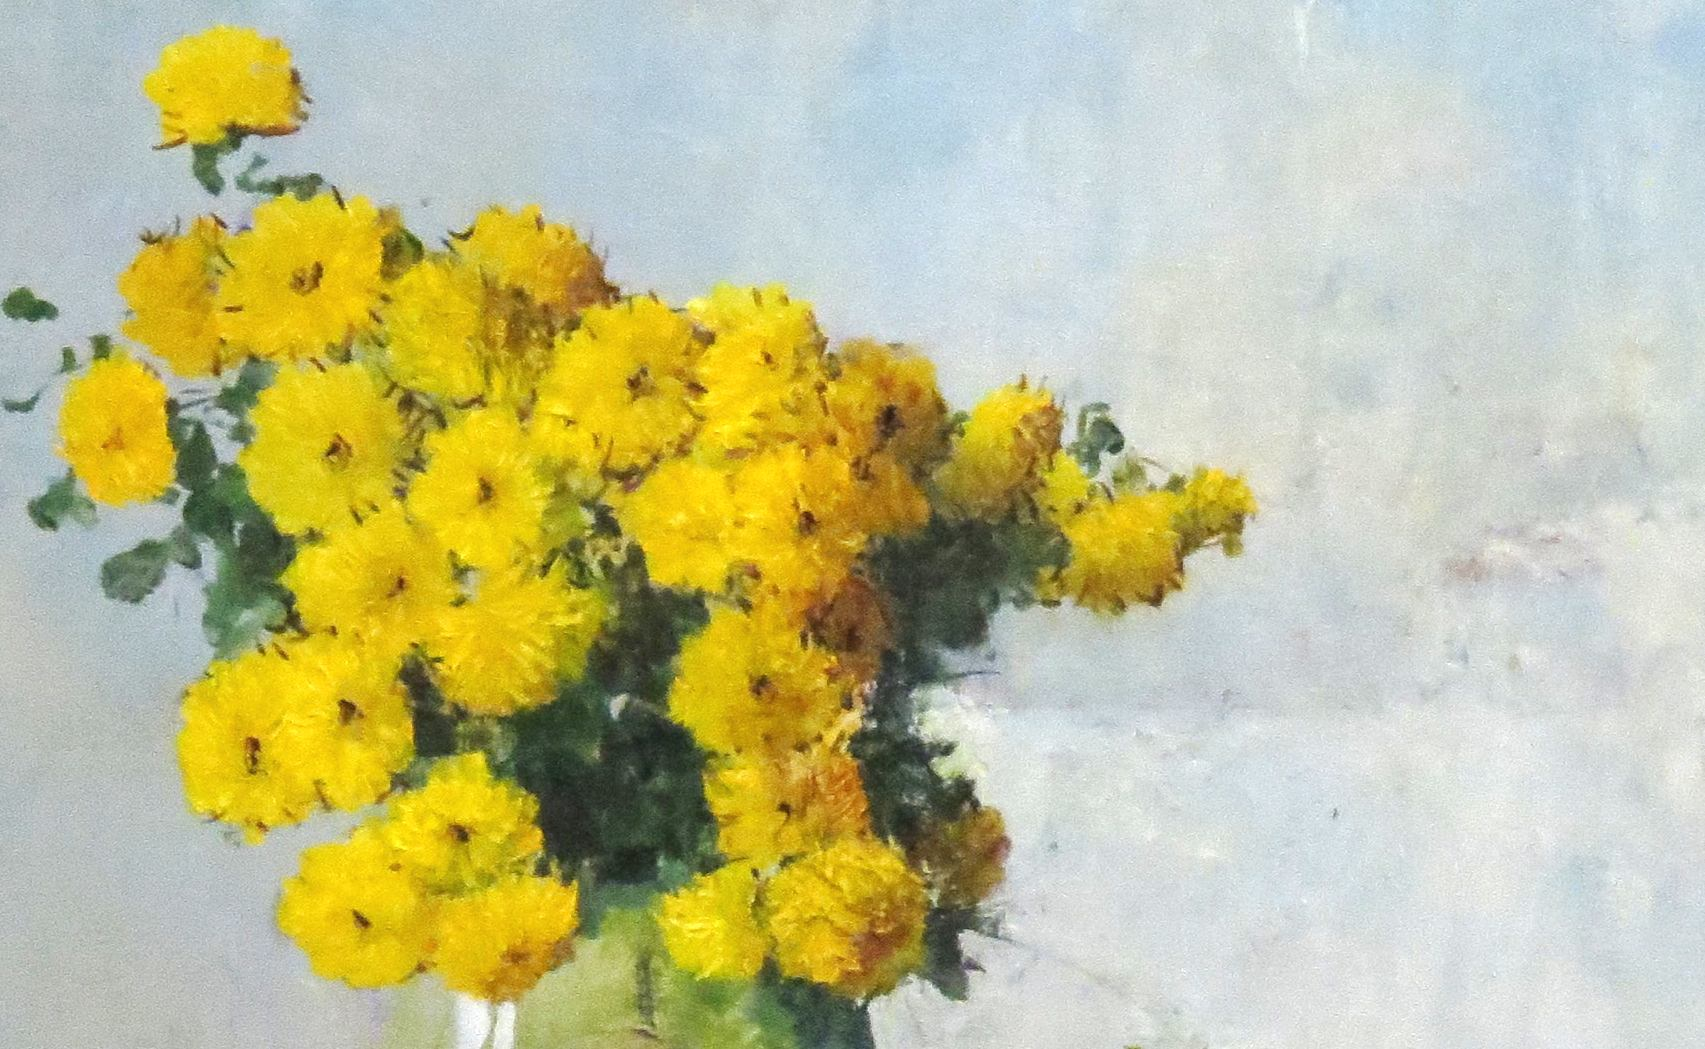 particolare fiore